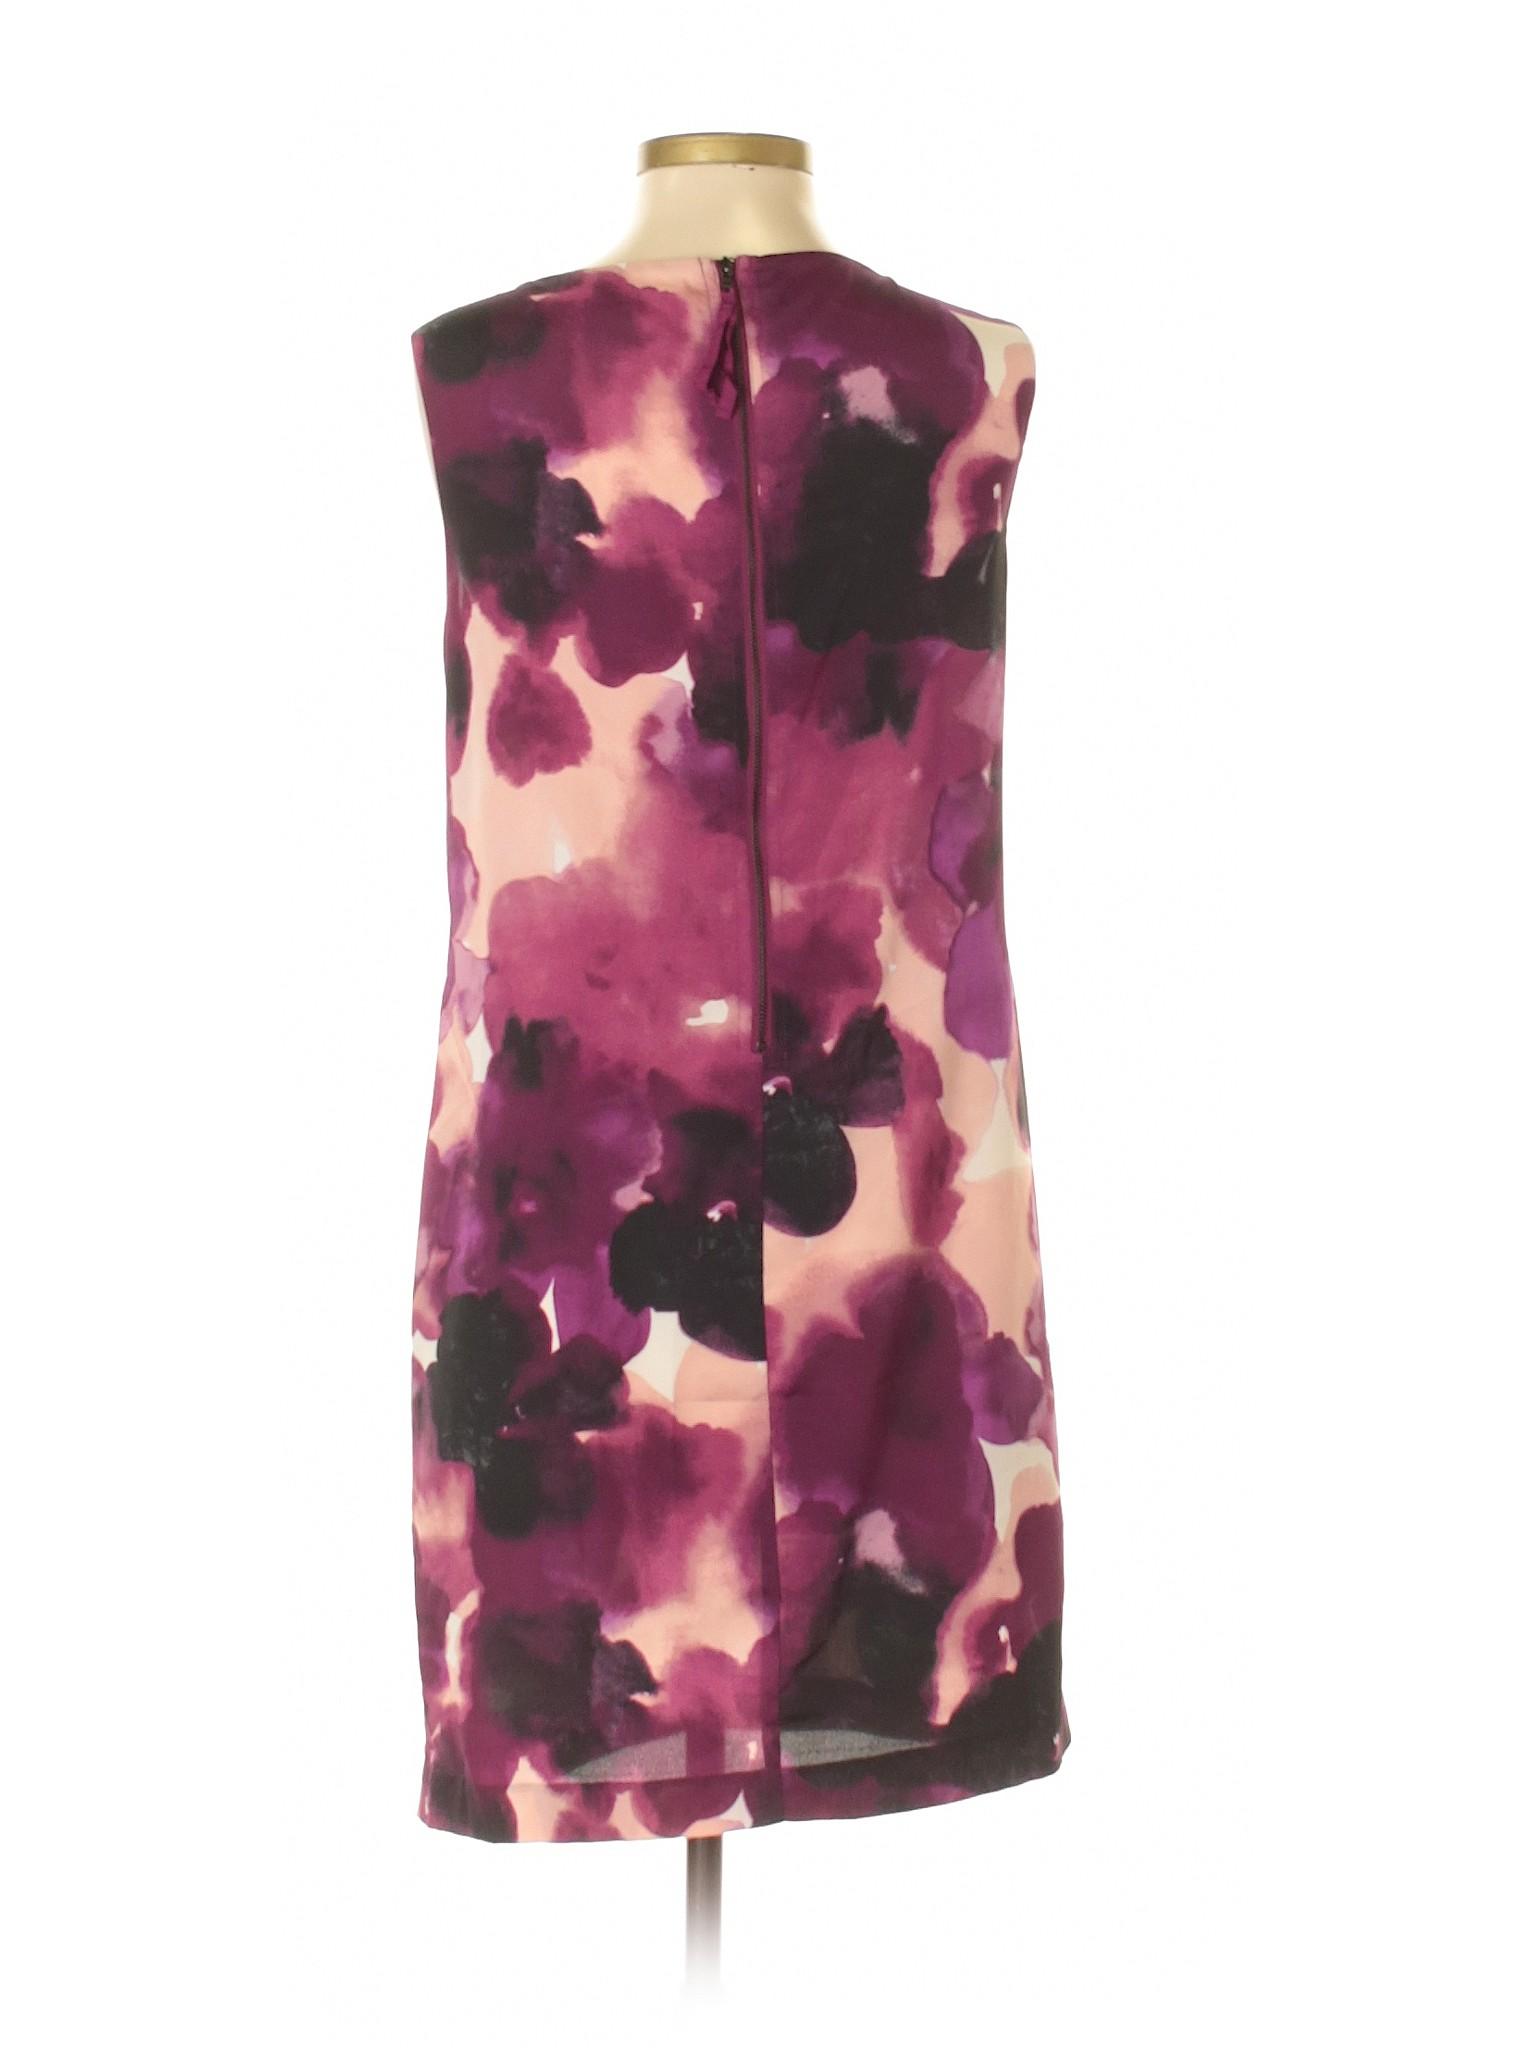 Ann Casual Dress Taylor winter LOFT Boutique 5ZxvPg